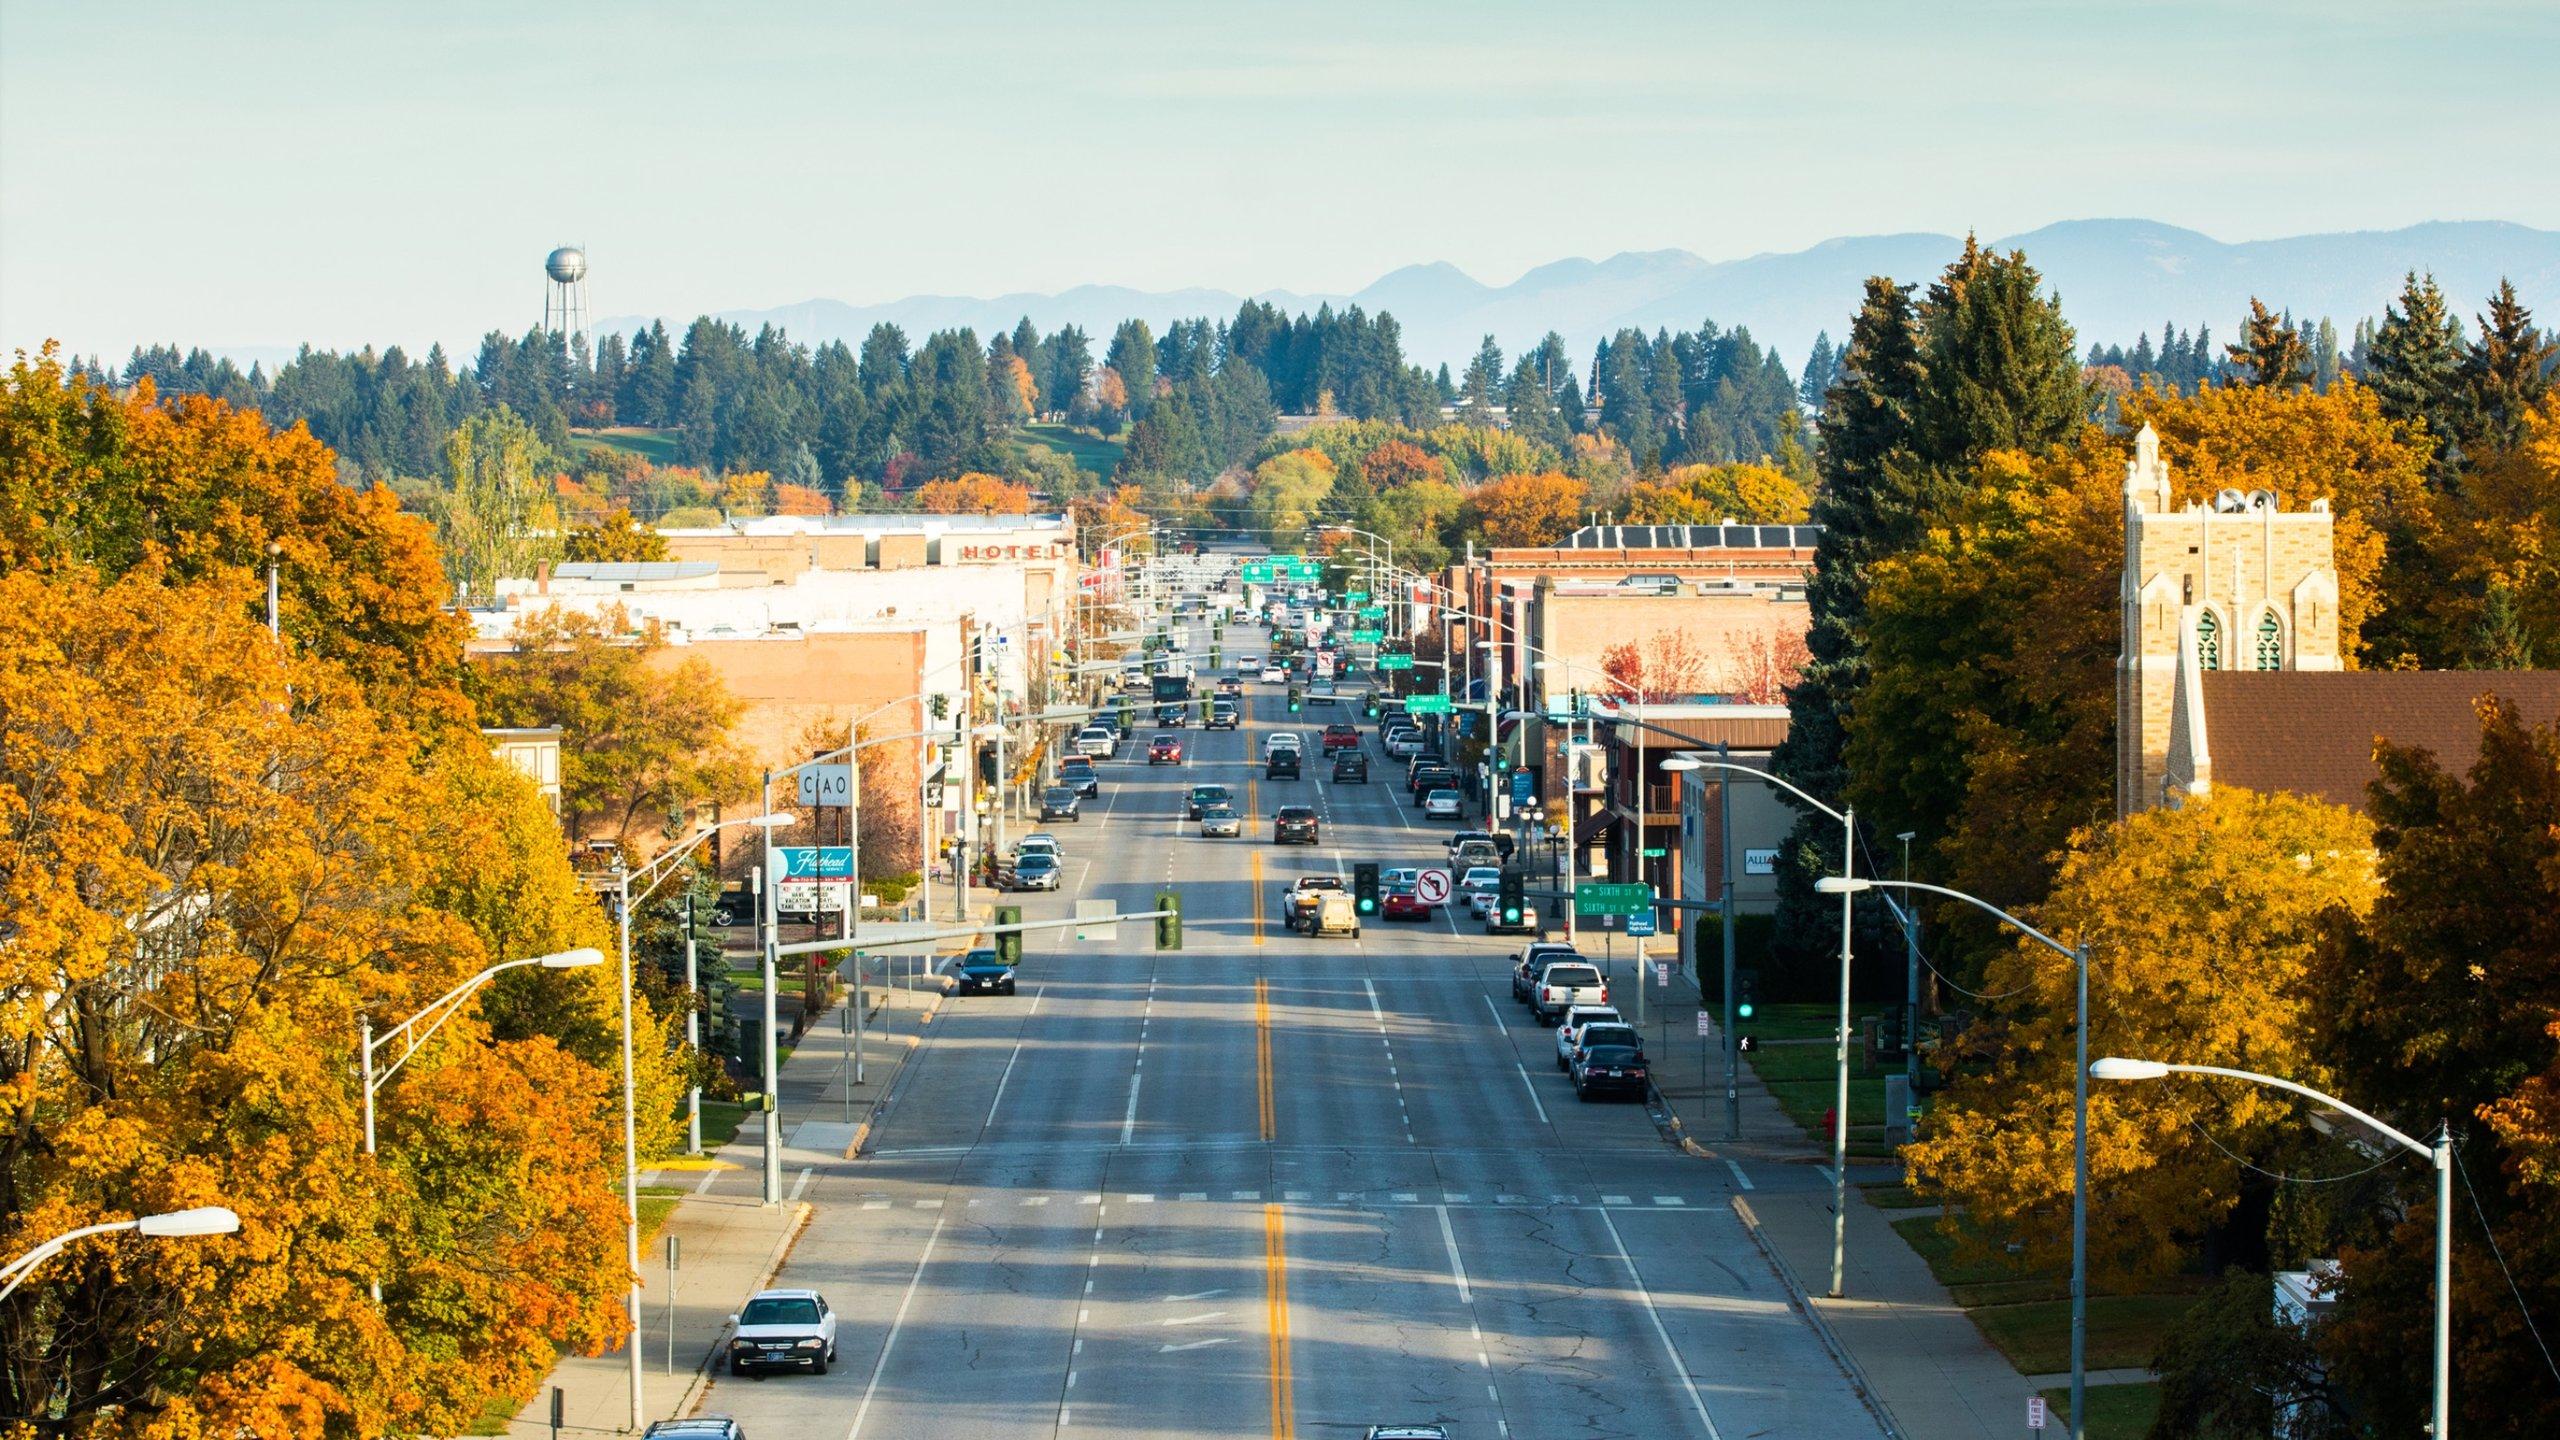 Kalispell, Montana, United States of America